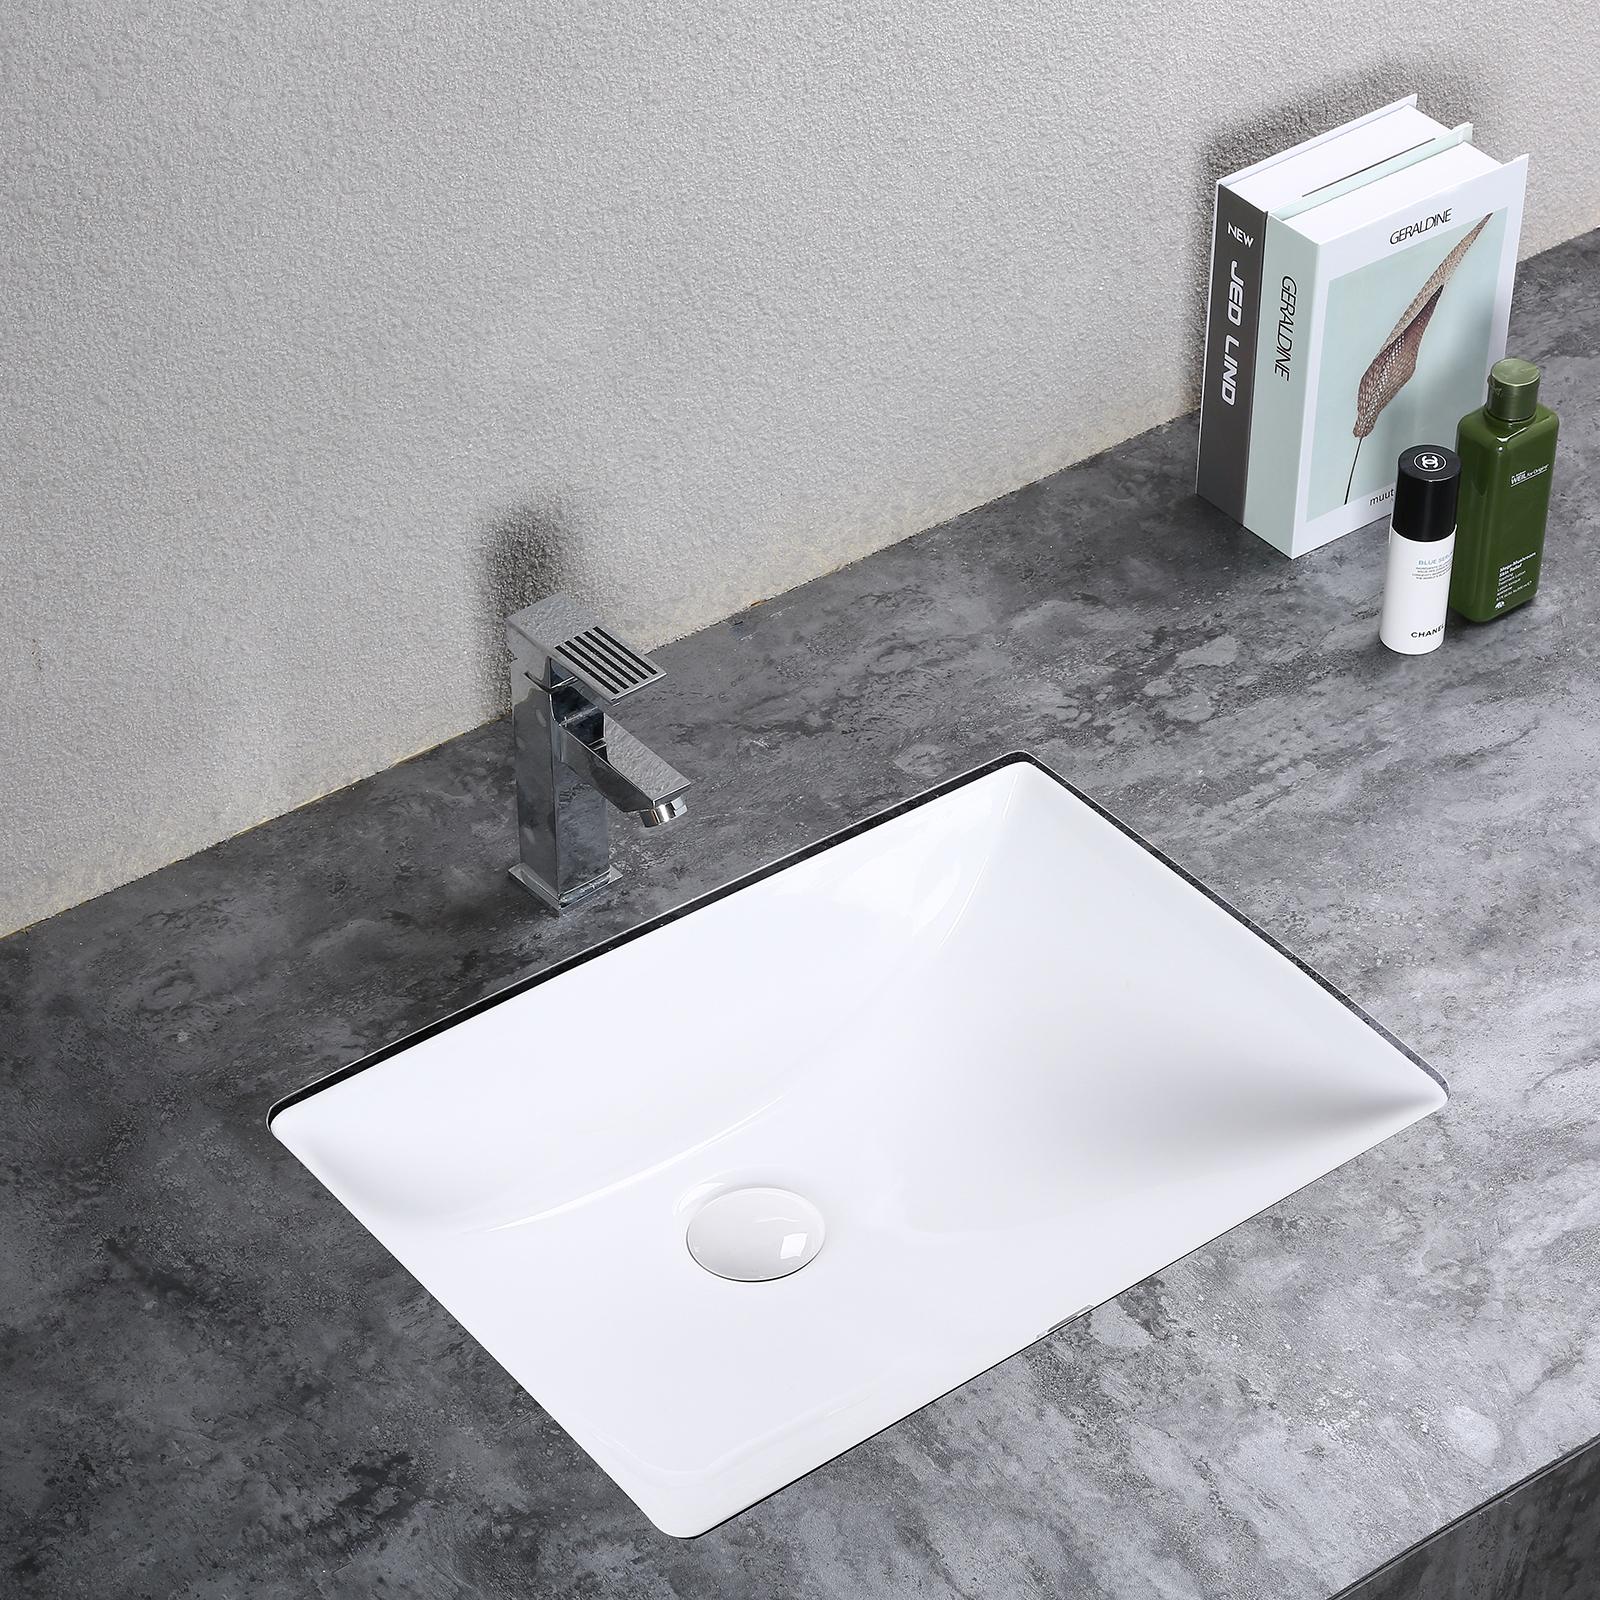 Details About Kleankin Rectangular Ceramic Vessel Sink Modern Undermount Art Basin Bathroom for measurements 1600 X 1600